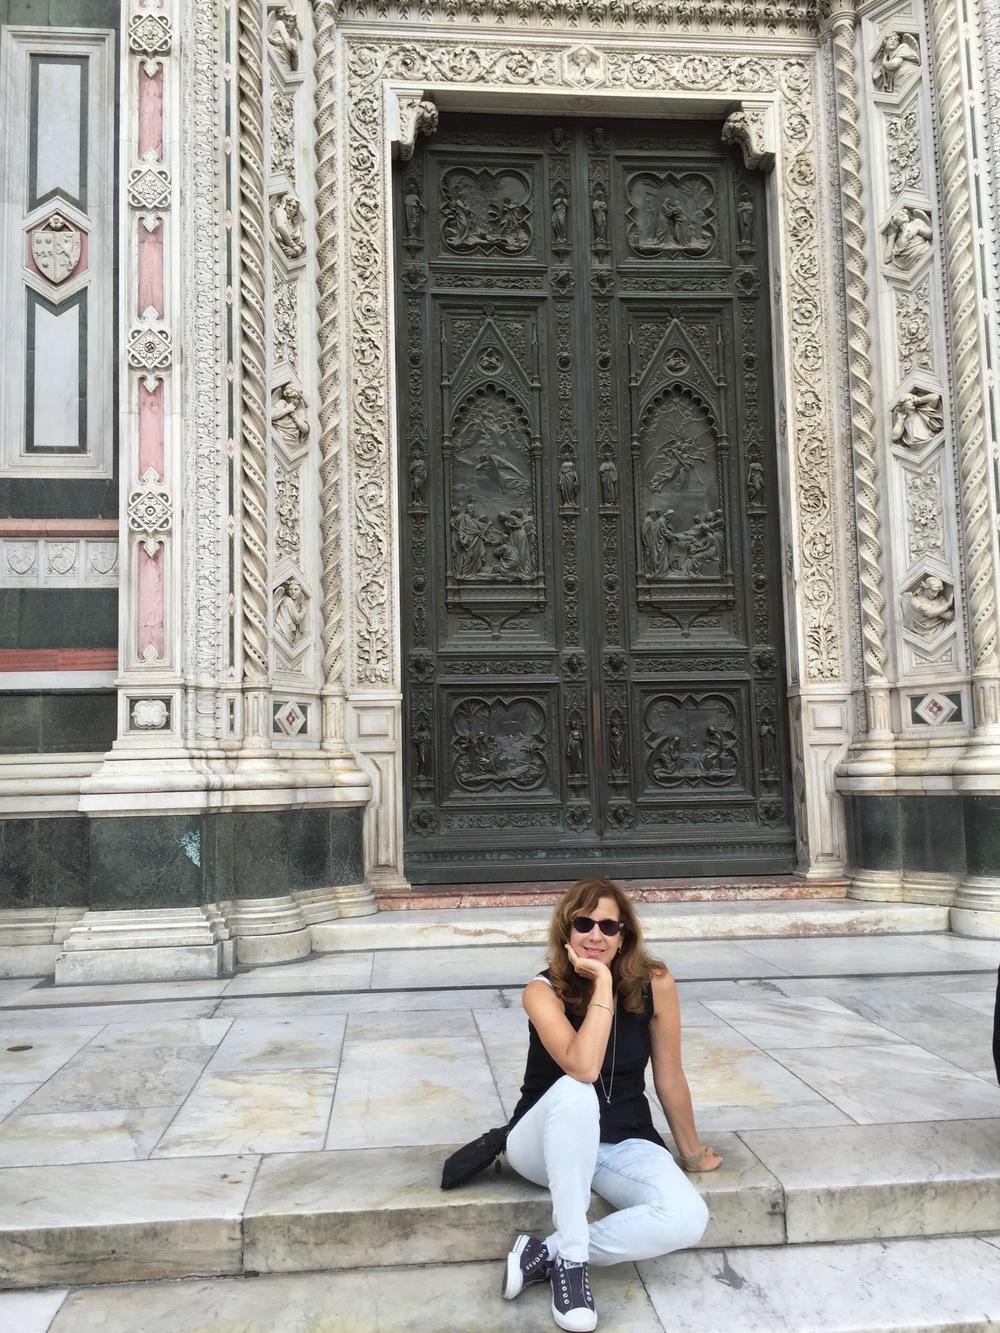 . ....like Florence, Italy